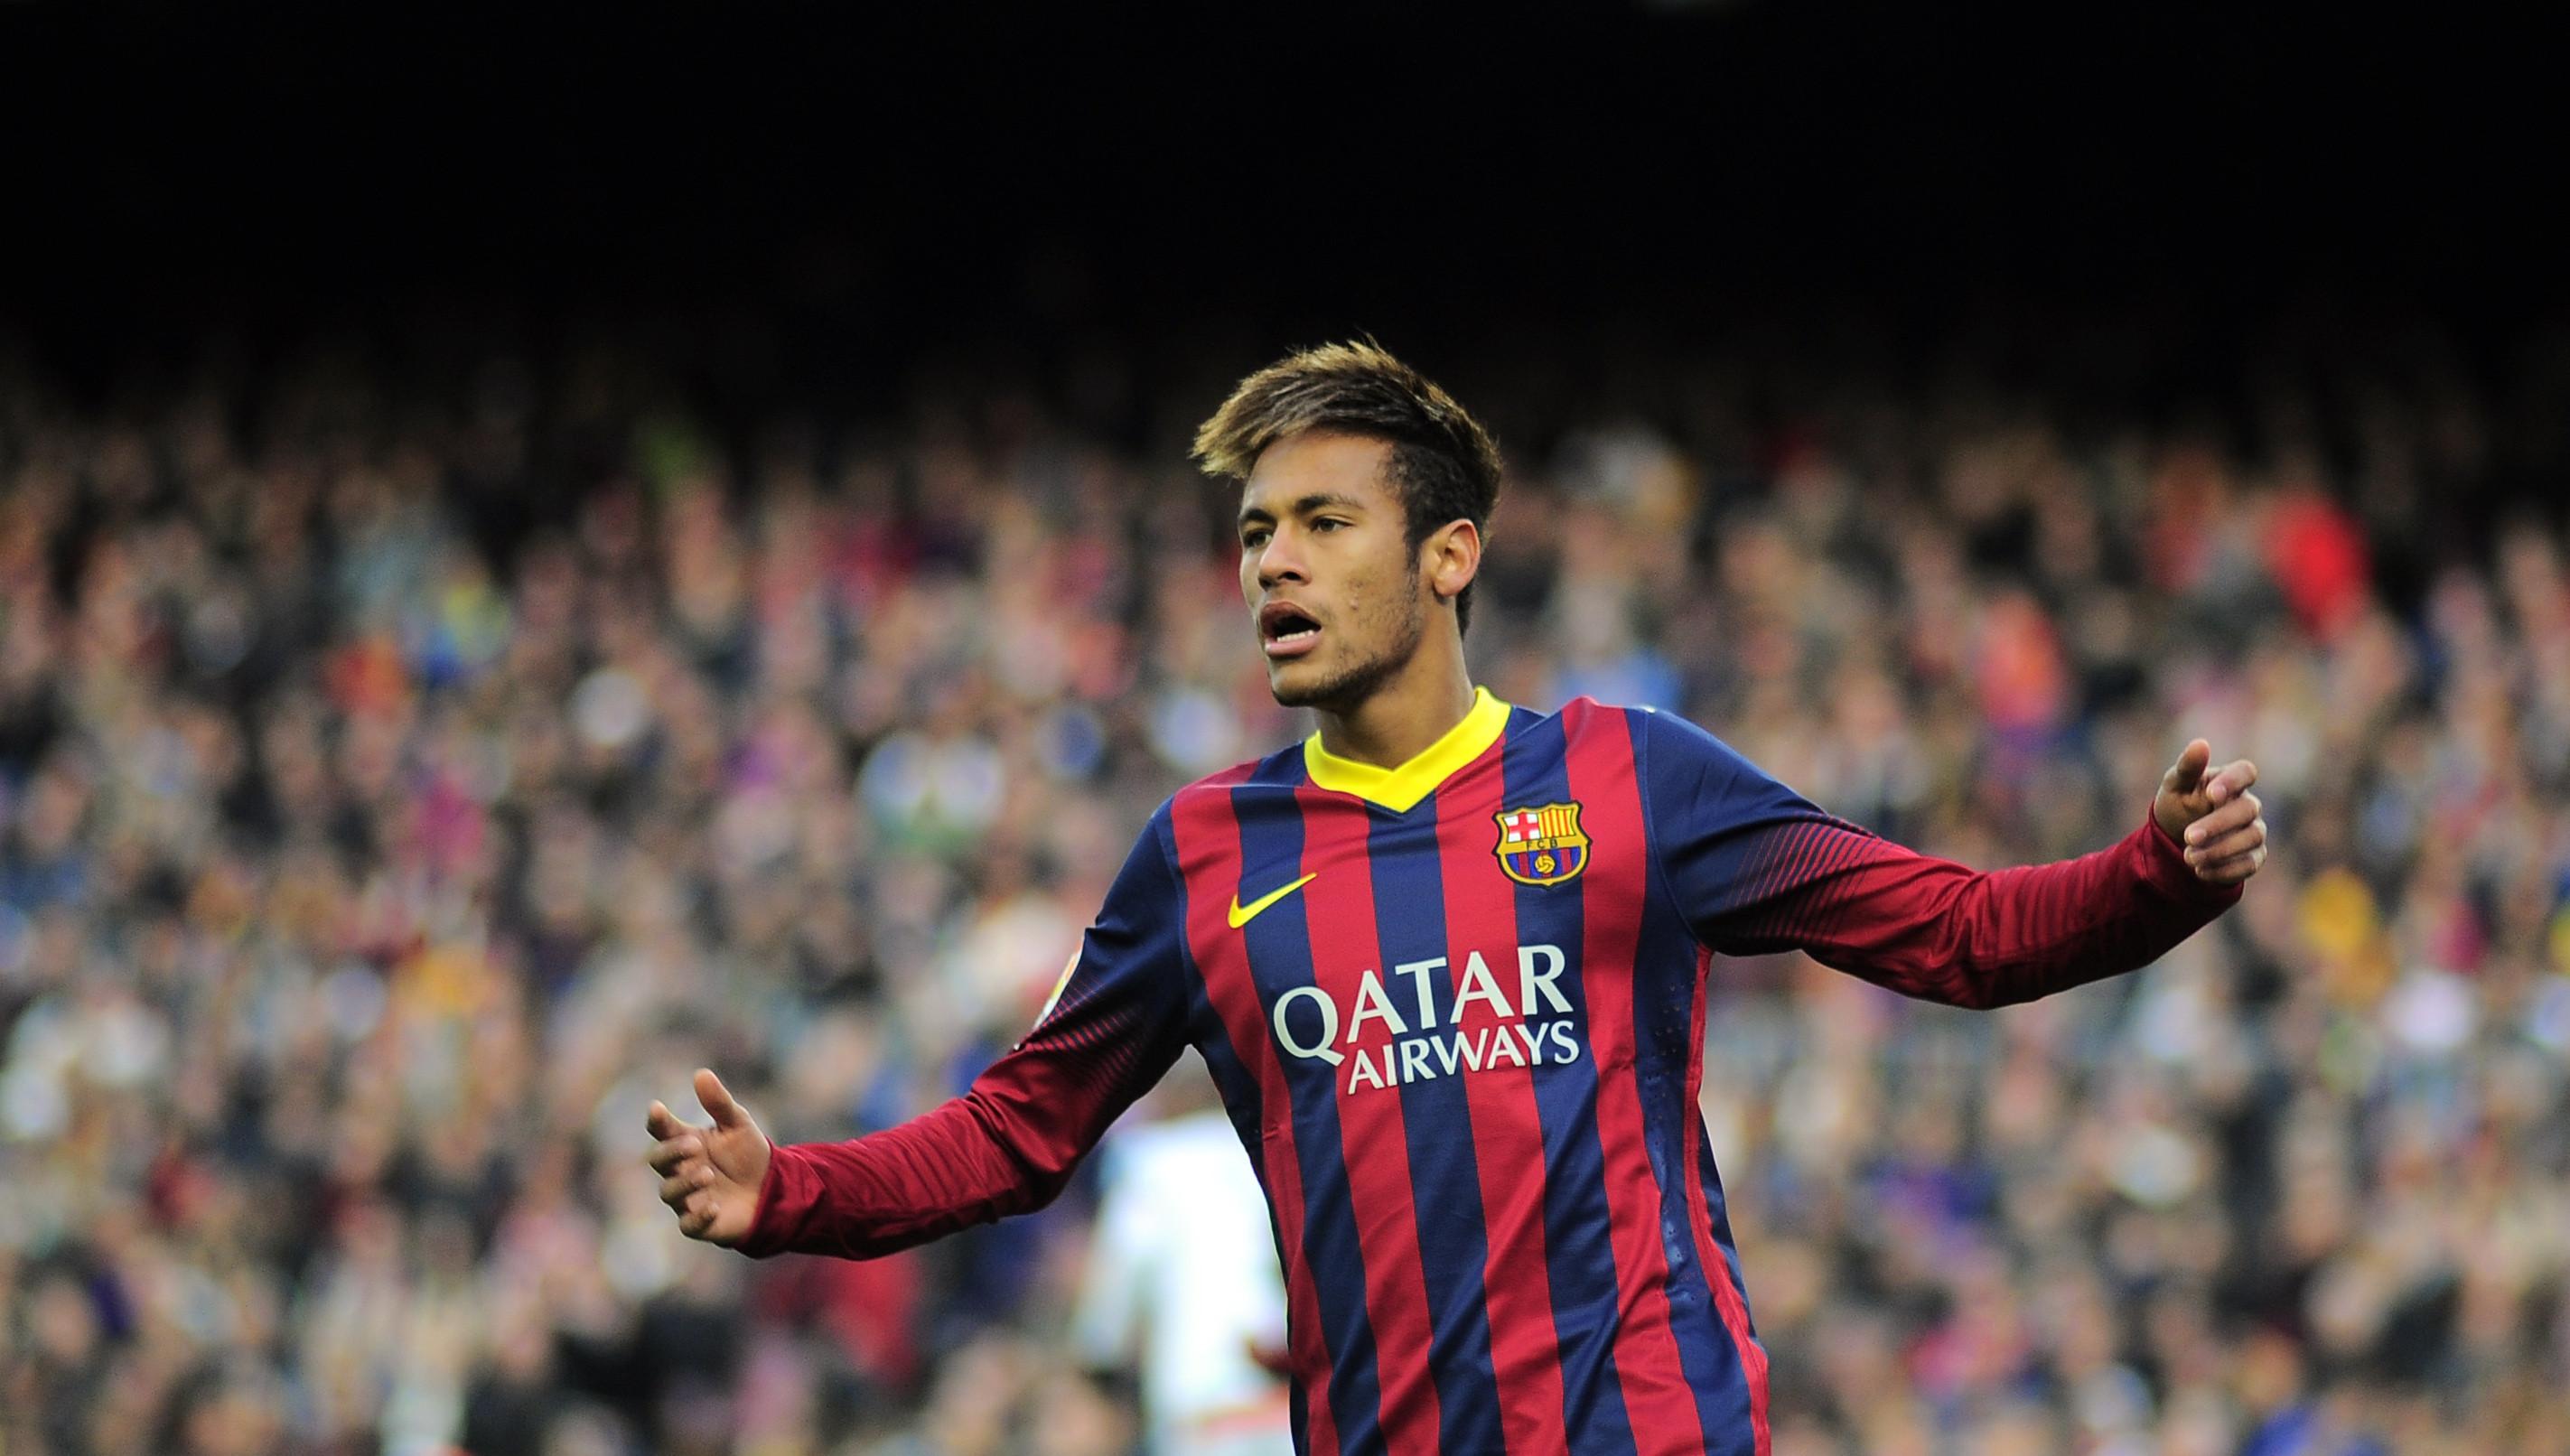 Neymar High Definition Wallpapers